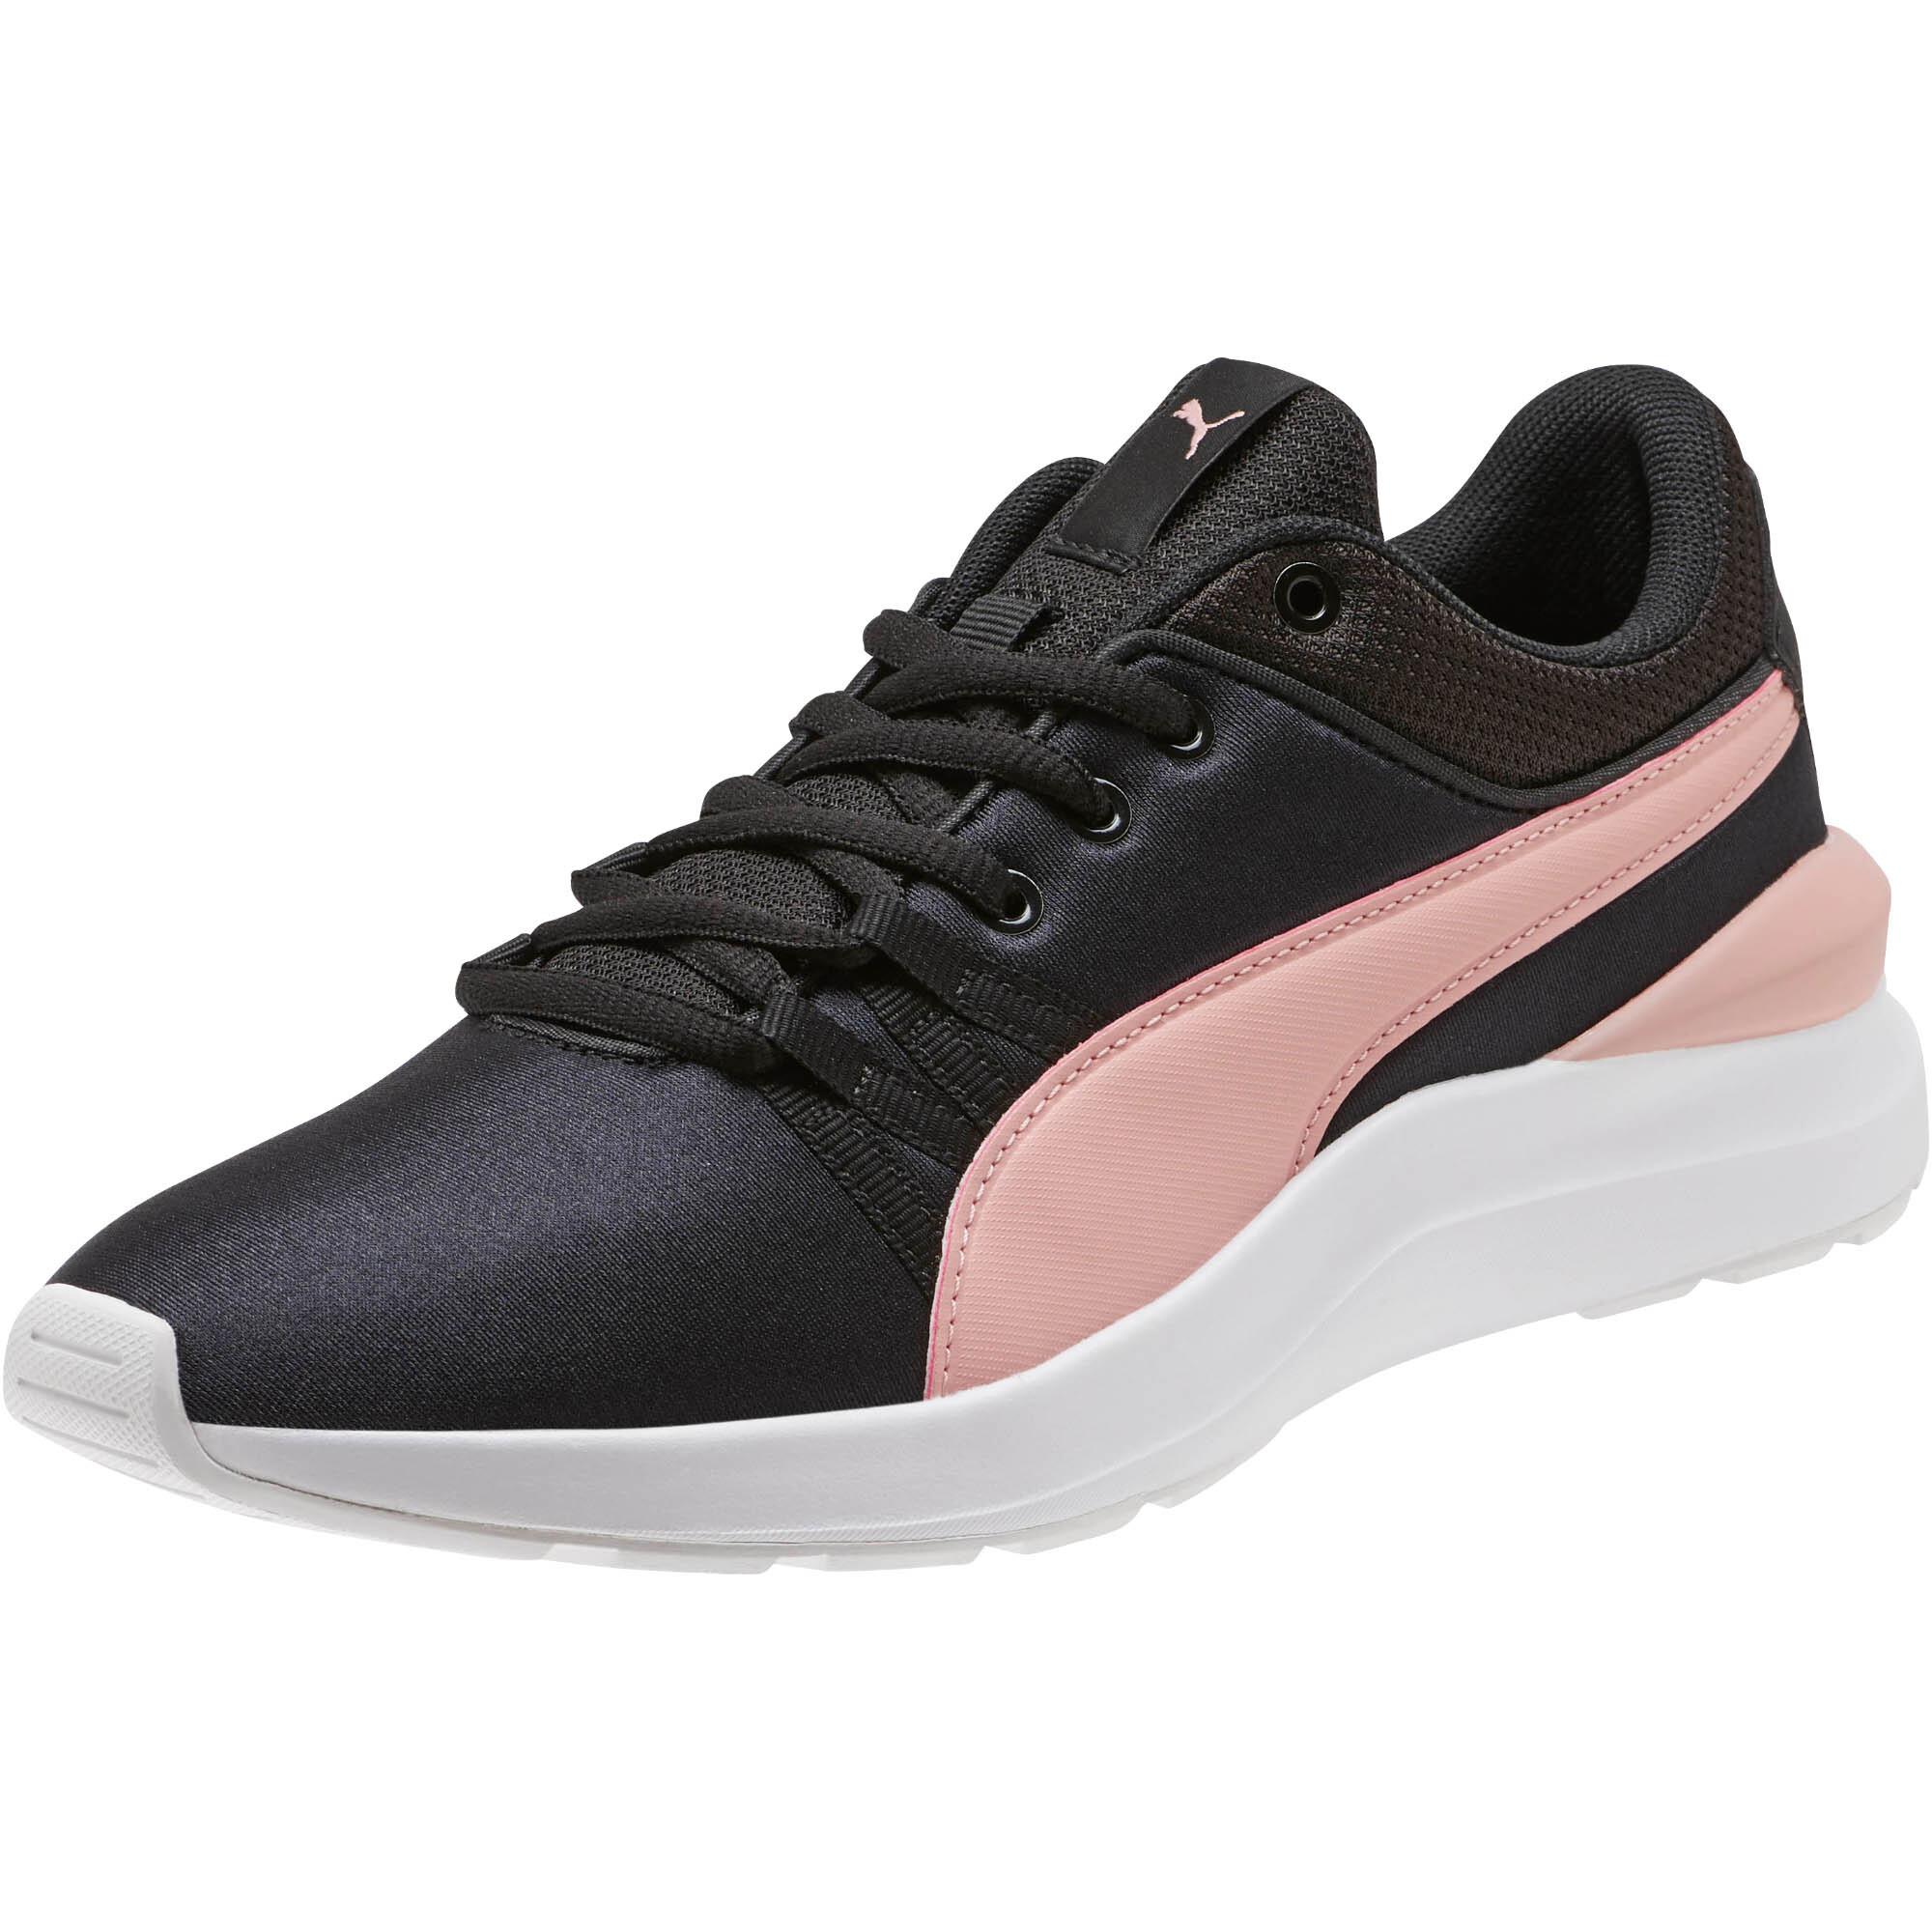 PUMA-Adela-Girl-s-Sneakers-JR-Girls-Shoe-Kids thumbnail 4